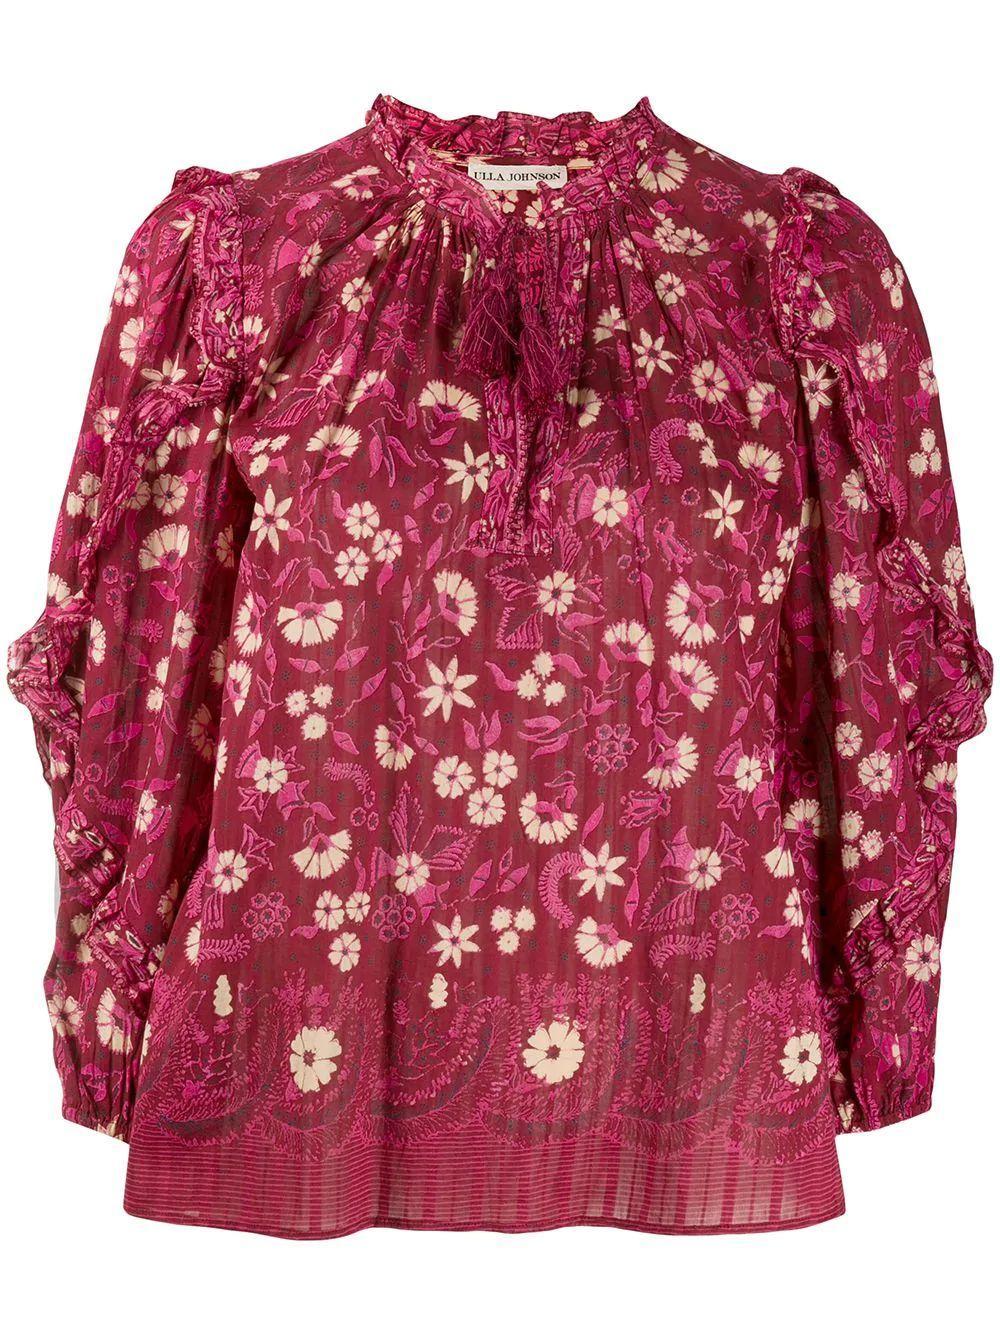 Azalea Long Sleeve Blouse Item # PS200228